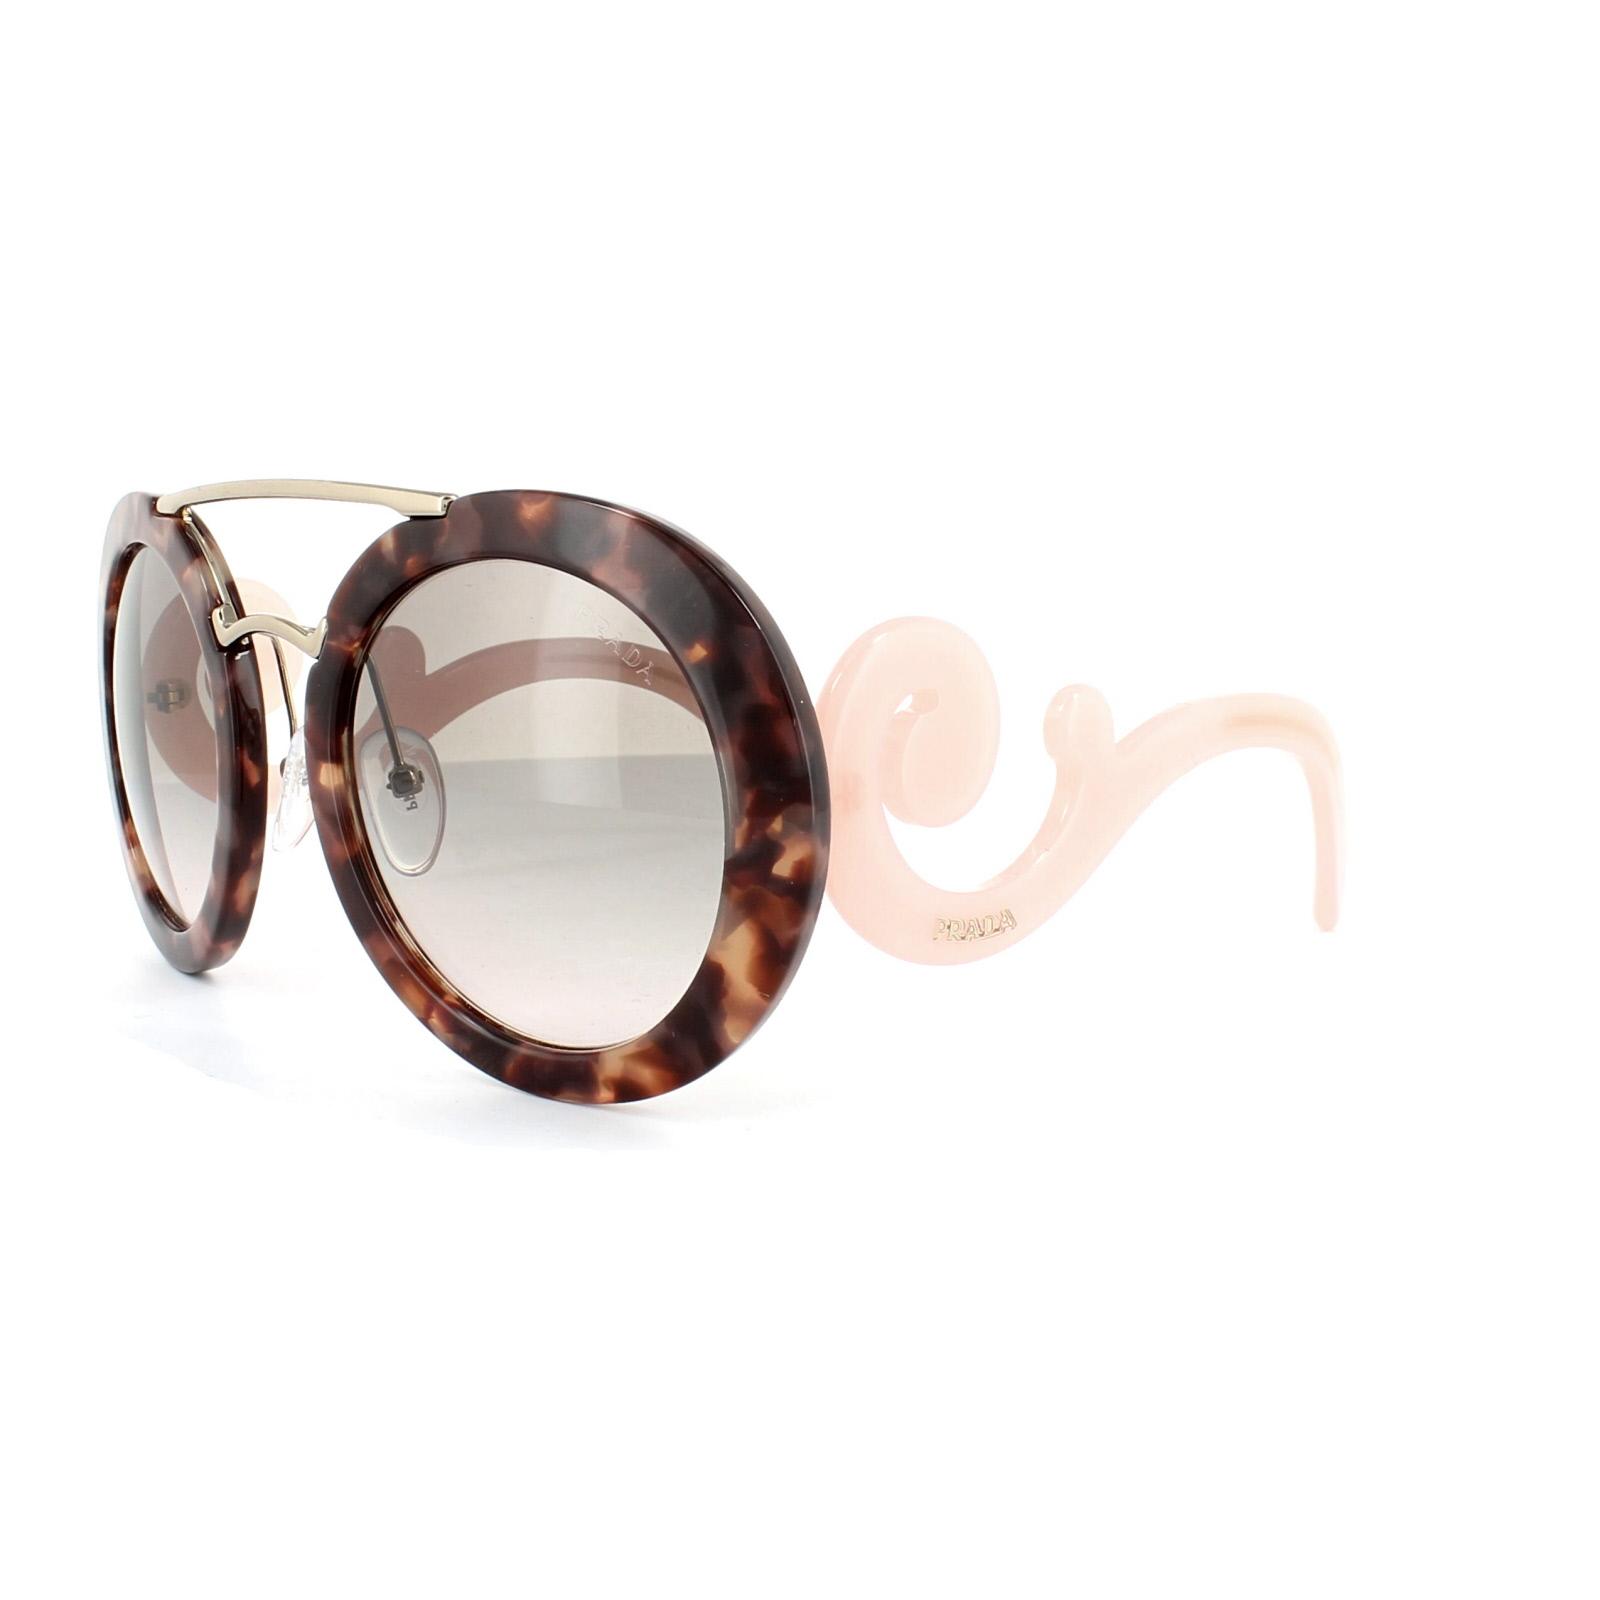 4c9a053d4af3 Sentinel Prada Sunglasses 13SS UE04K0 Spotted Brown Gold Pink Pink Grey  Gradient